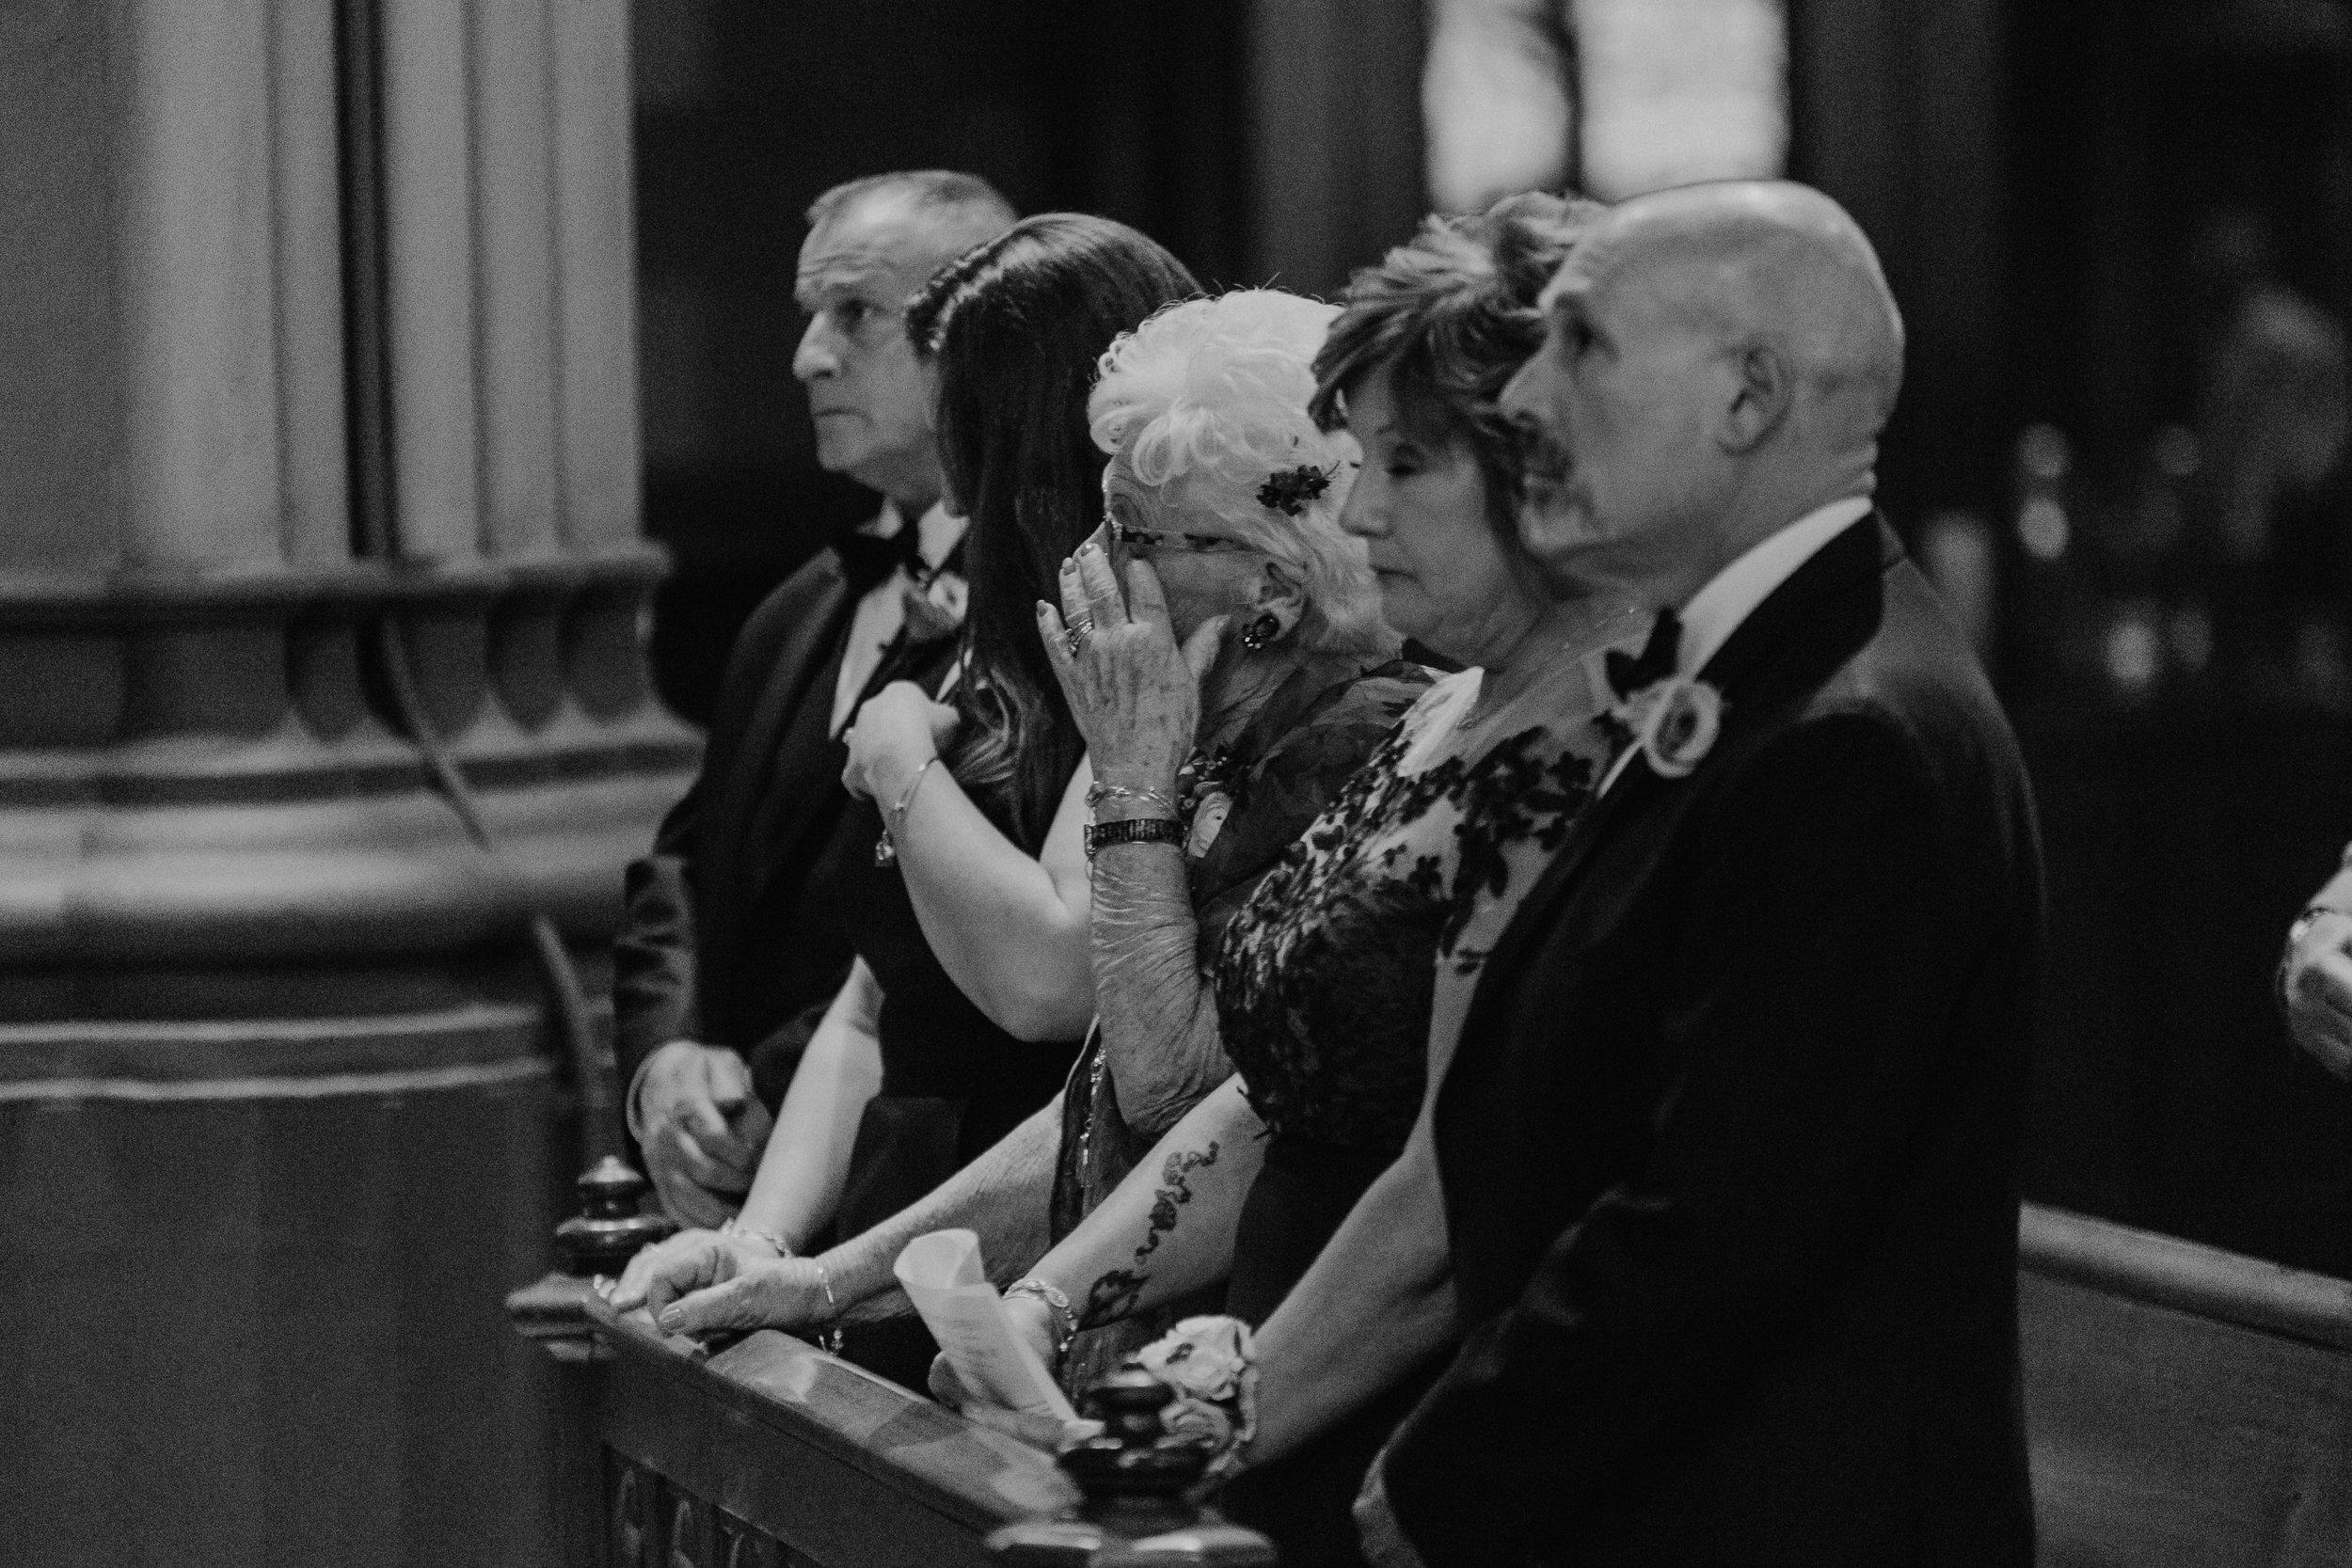 albany-new-york-wedding-24.jpg